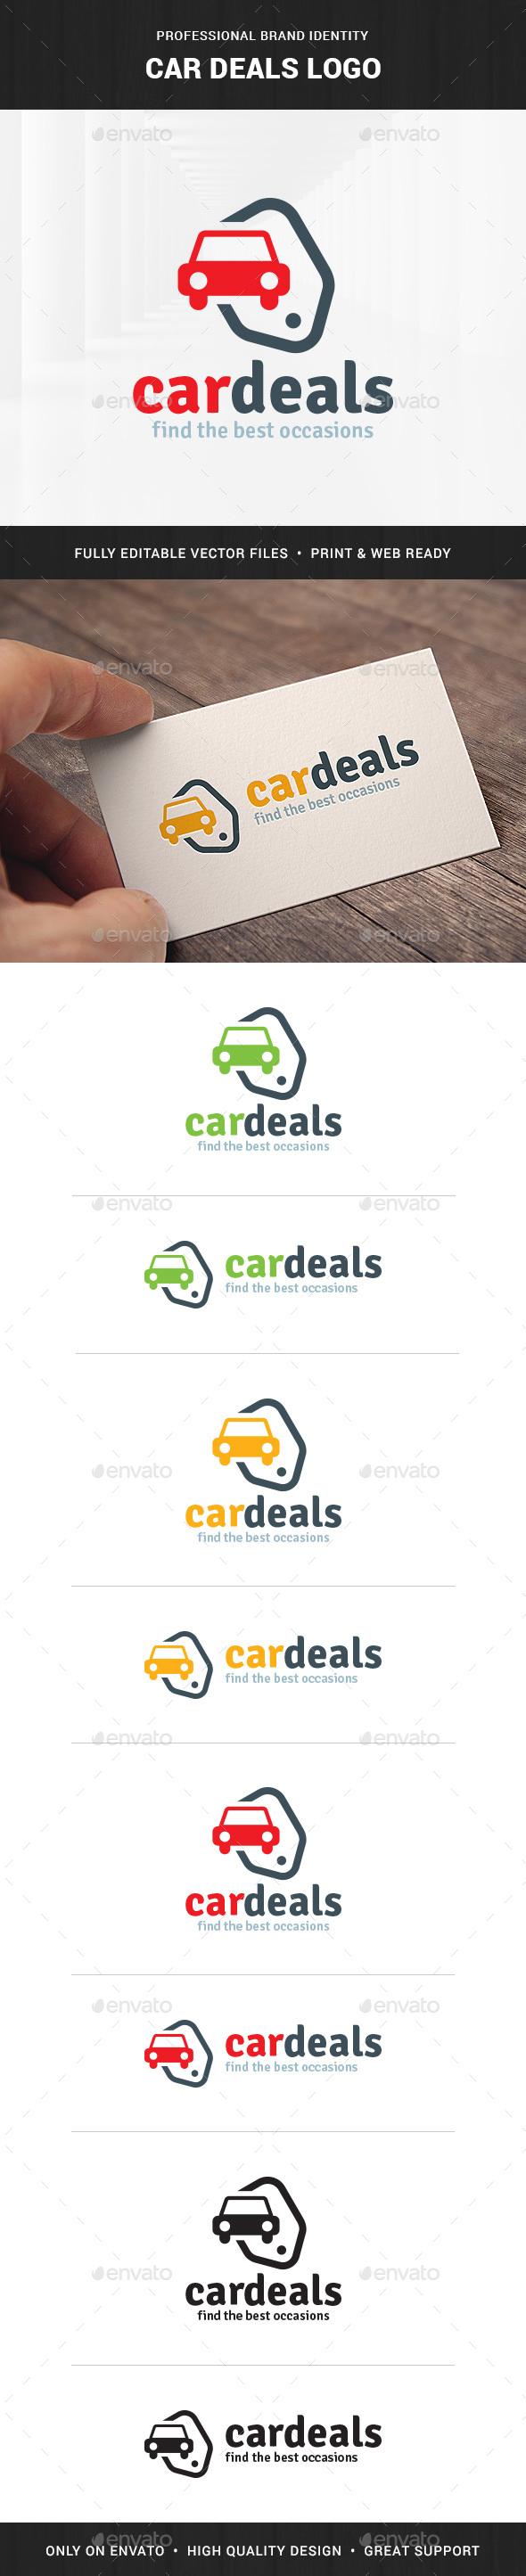 Car Deals Logo Template